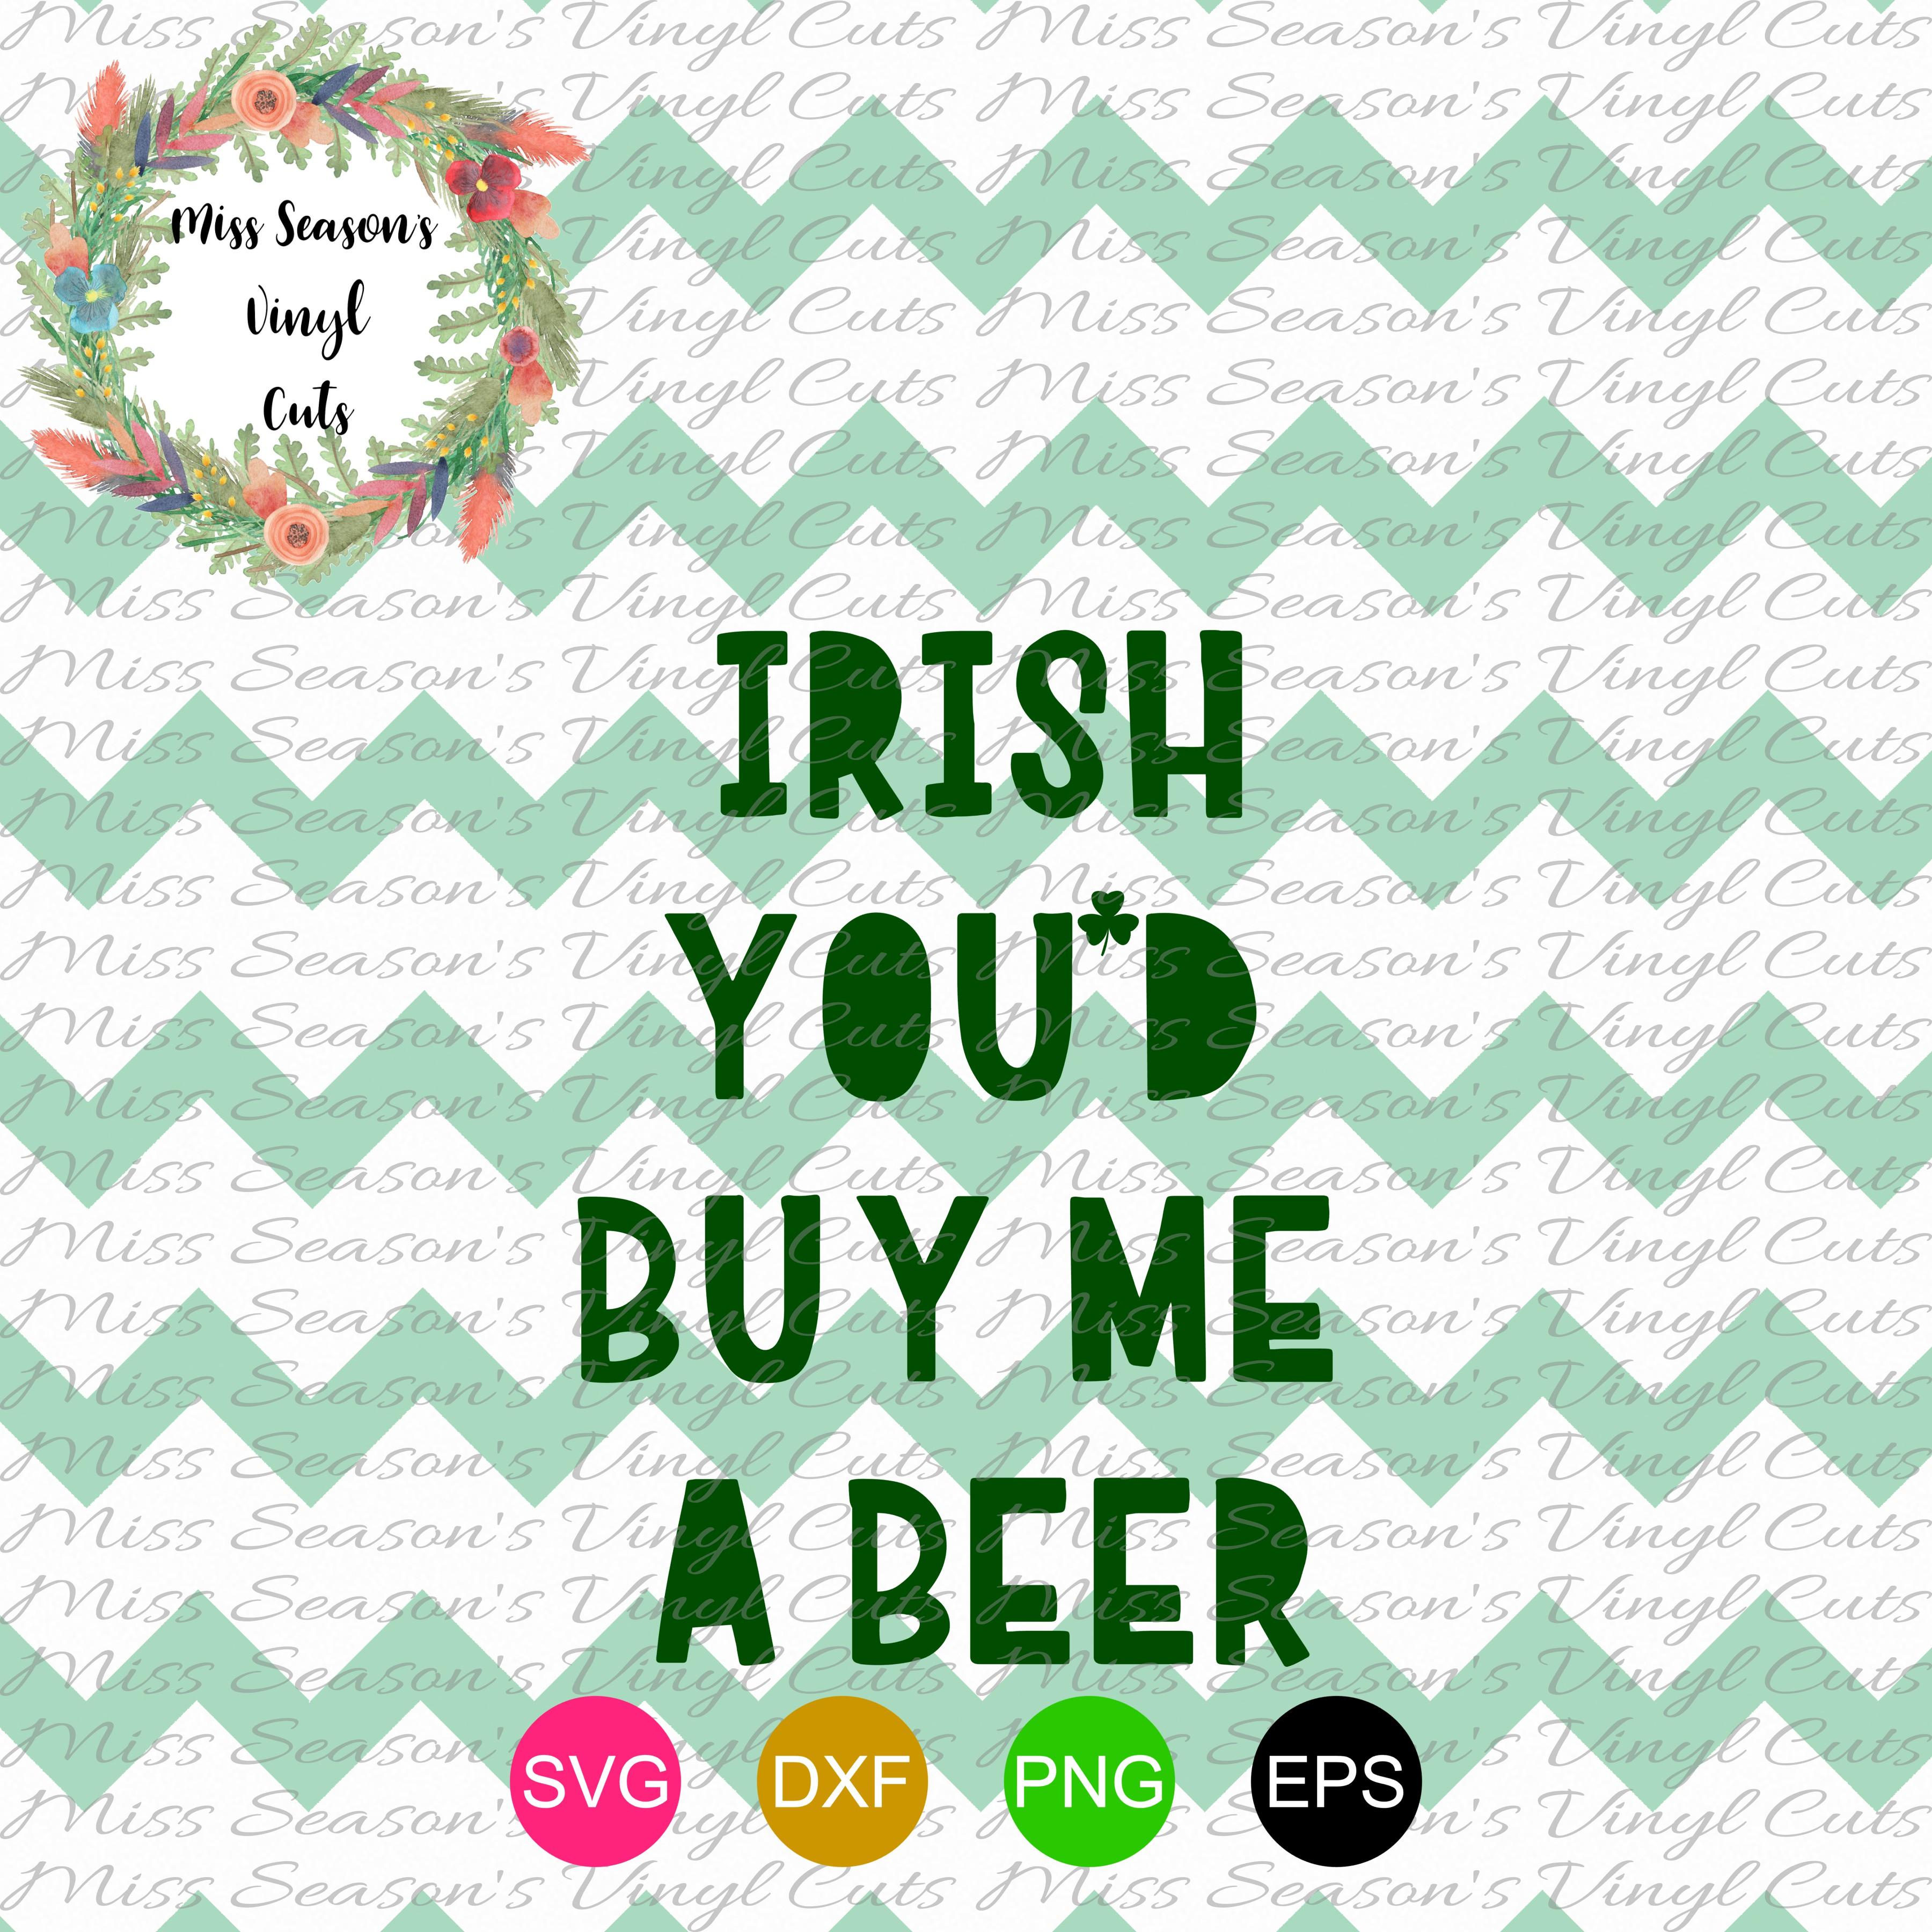 Irish Youd Buy Me a Beer SVG  example image 1